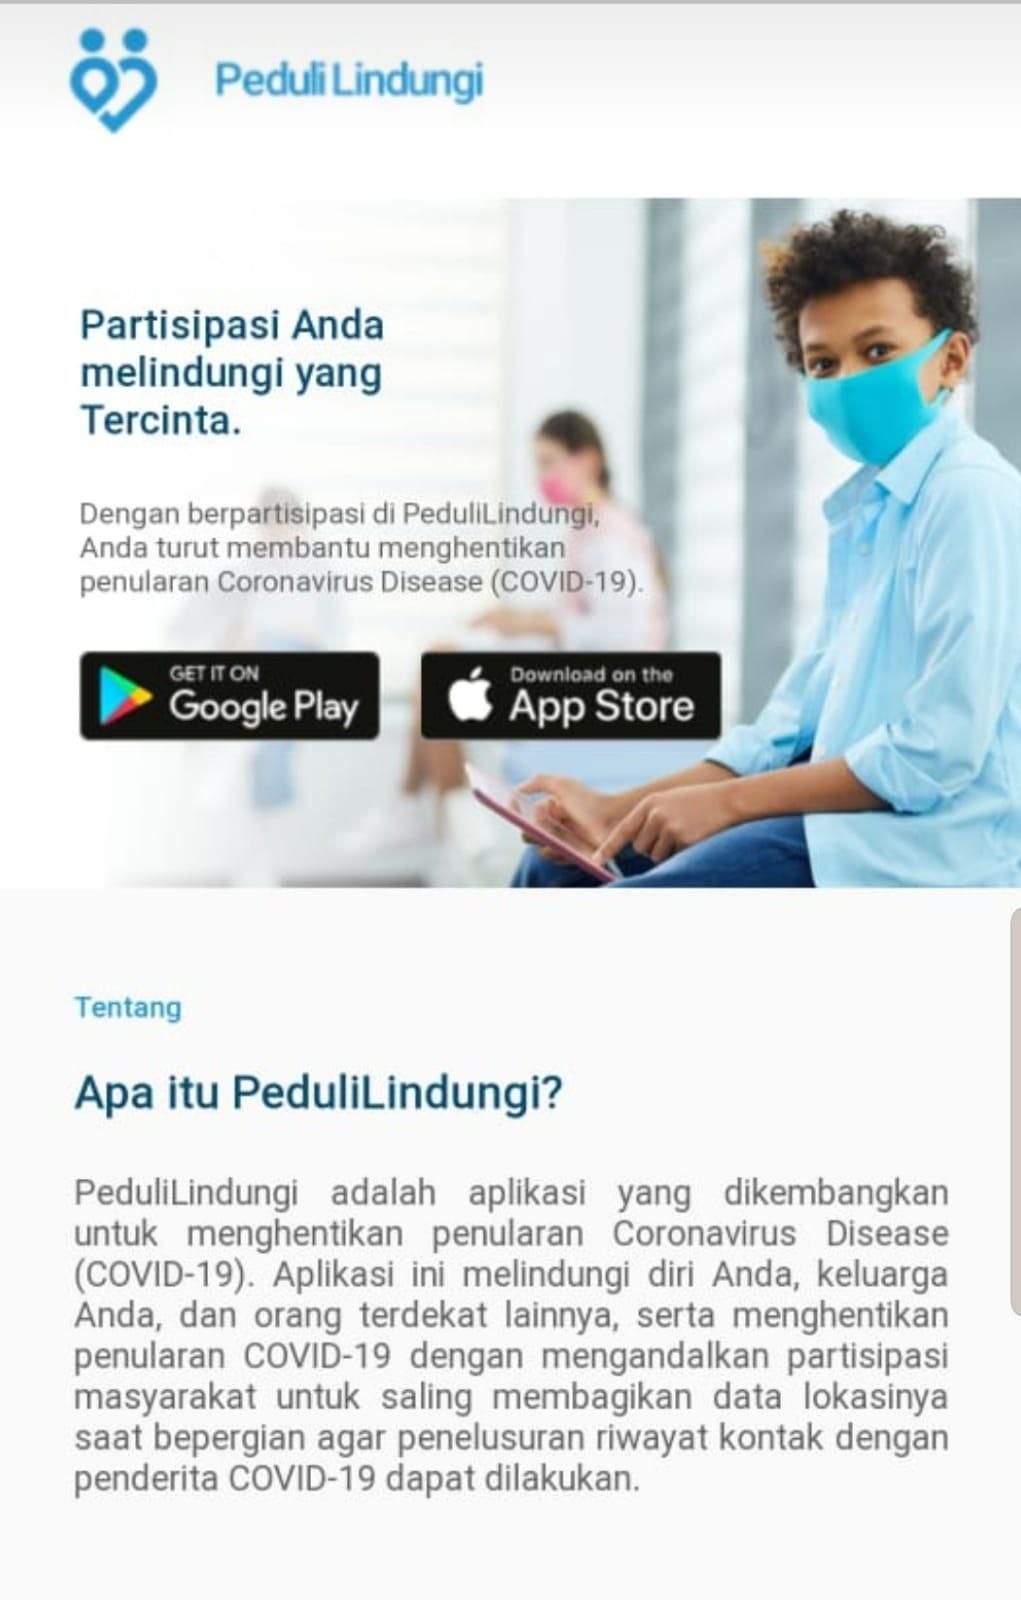 Aplikasi PeduliLindungi untuk melacak riwayat pergerakan pasien positif virus corona COVID-19 di Indonesia.